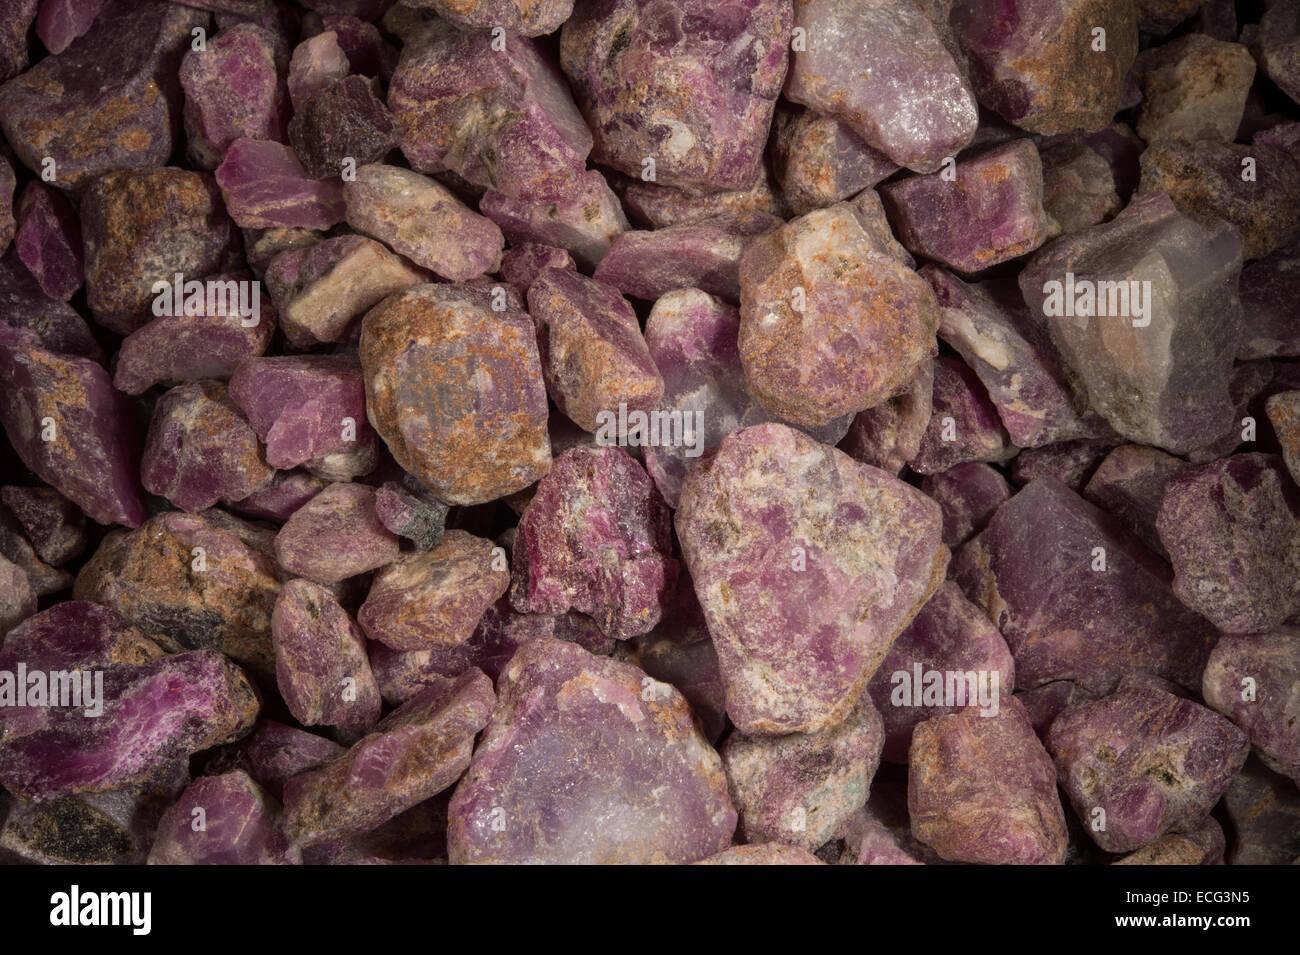 Raw rubin Ethiopia, Africa - Stock Image